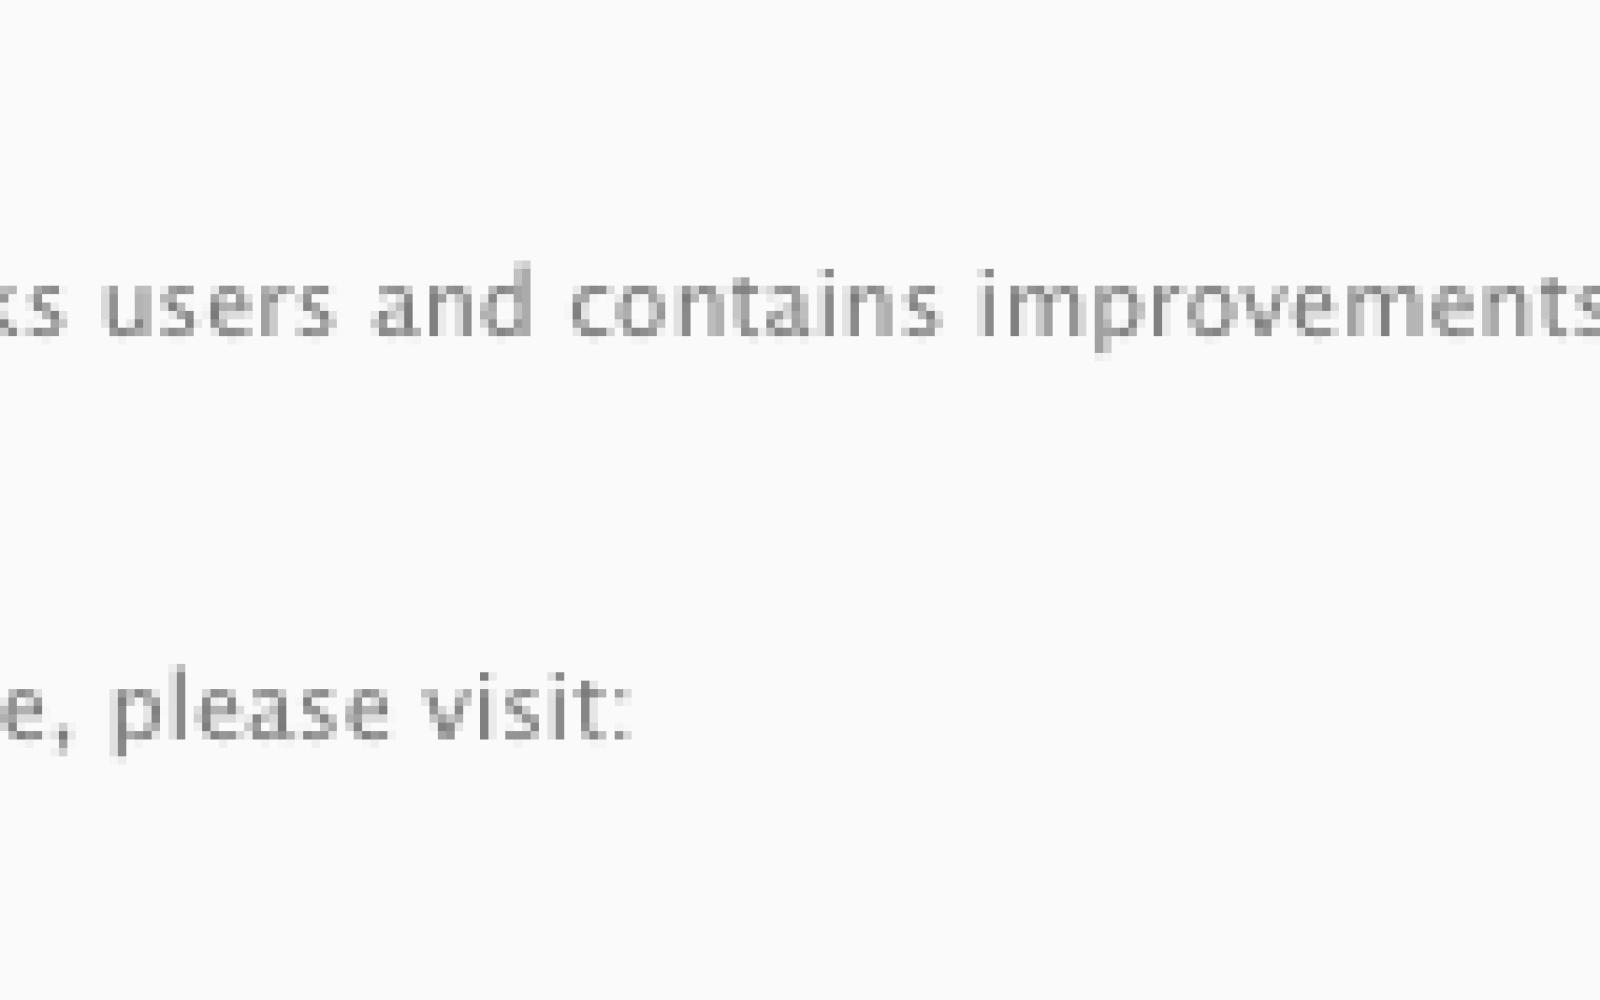 Apple releases Safari 6.1.6 and Safari 7.0.6 with security fixes